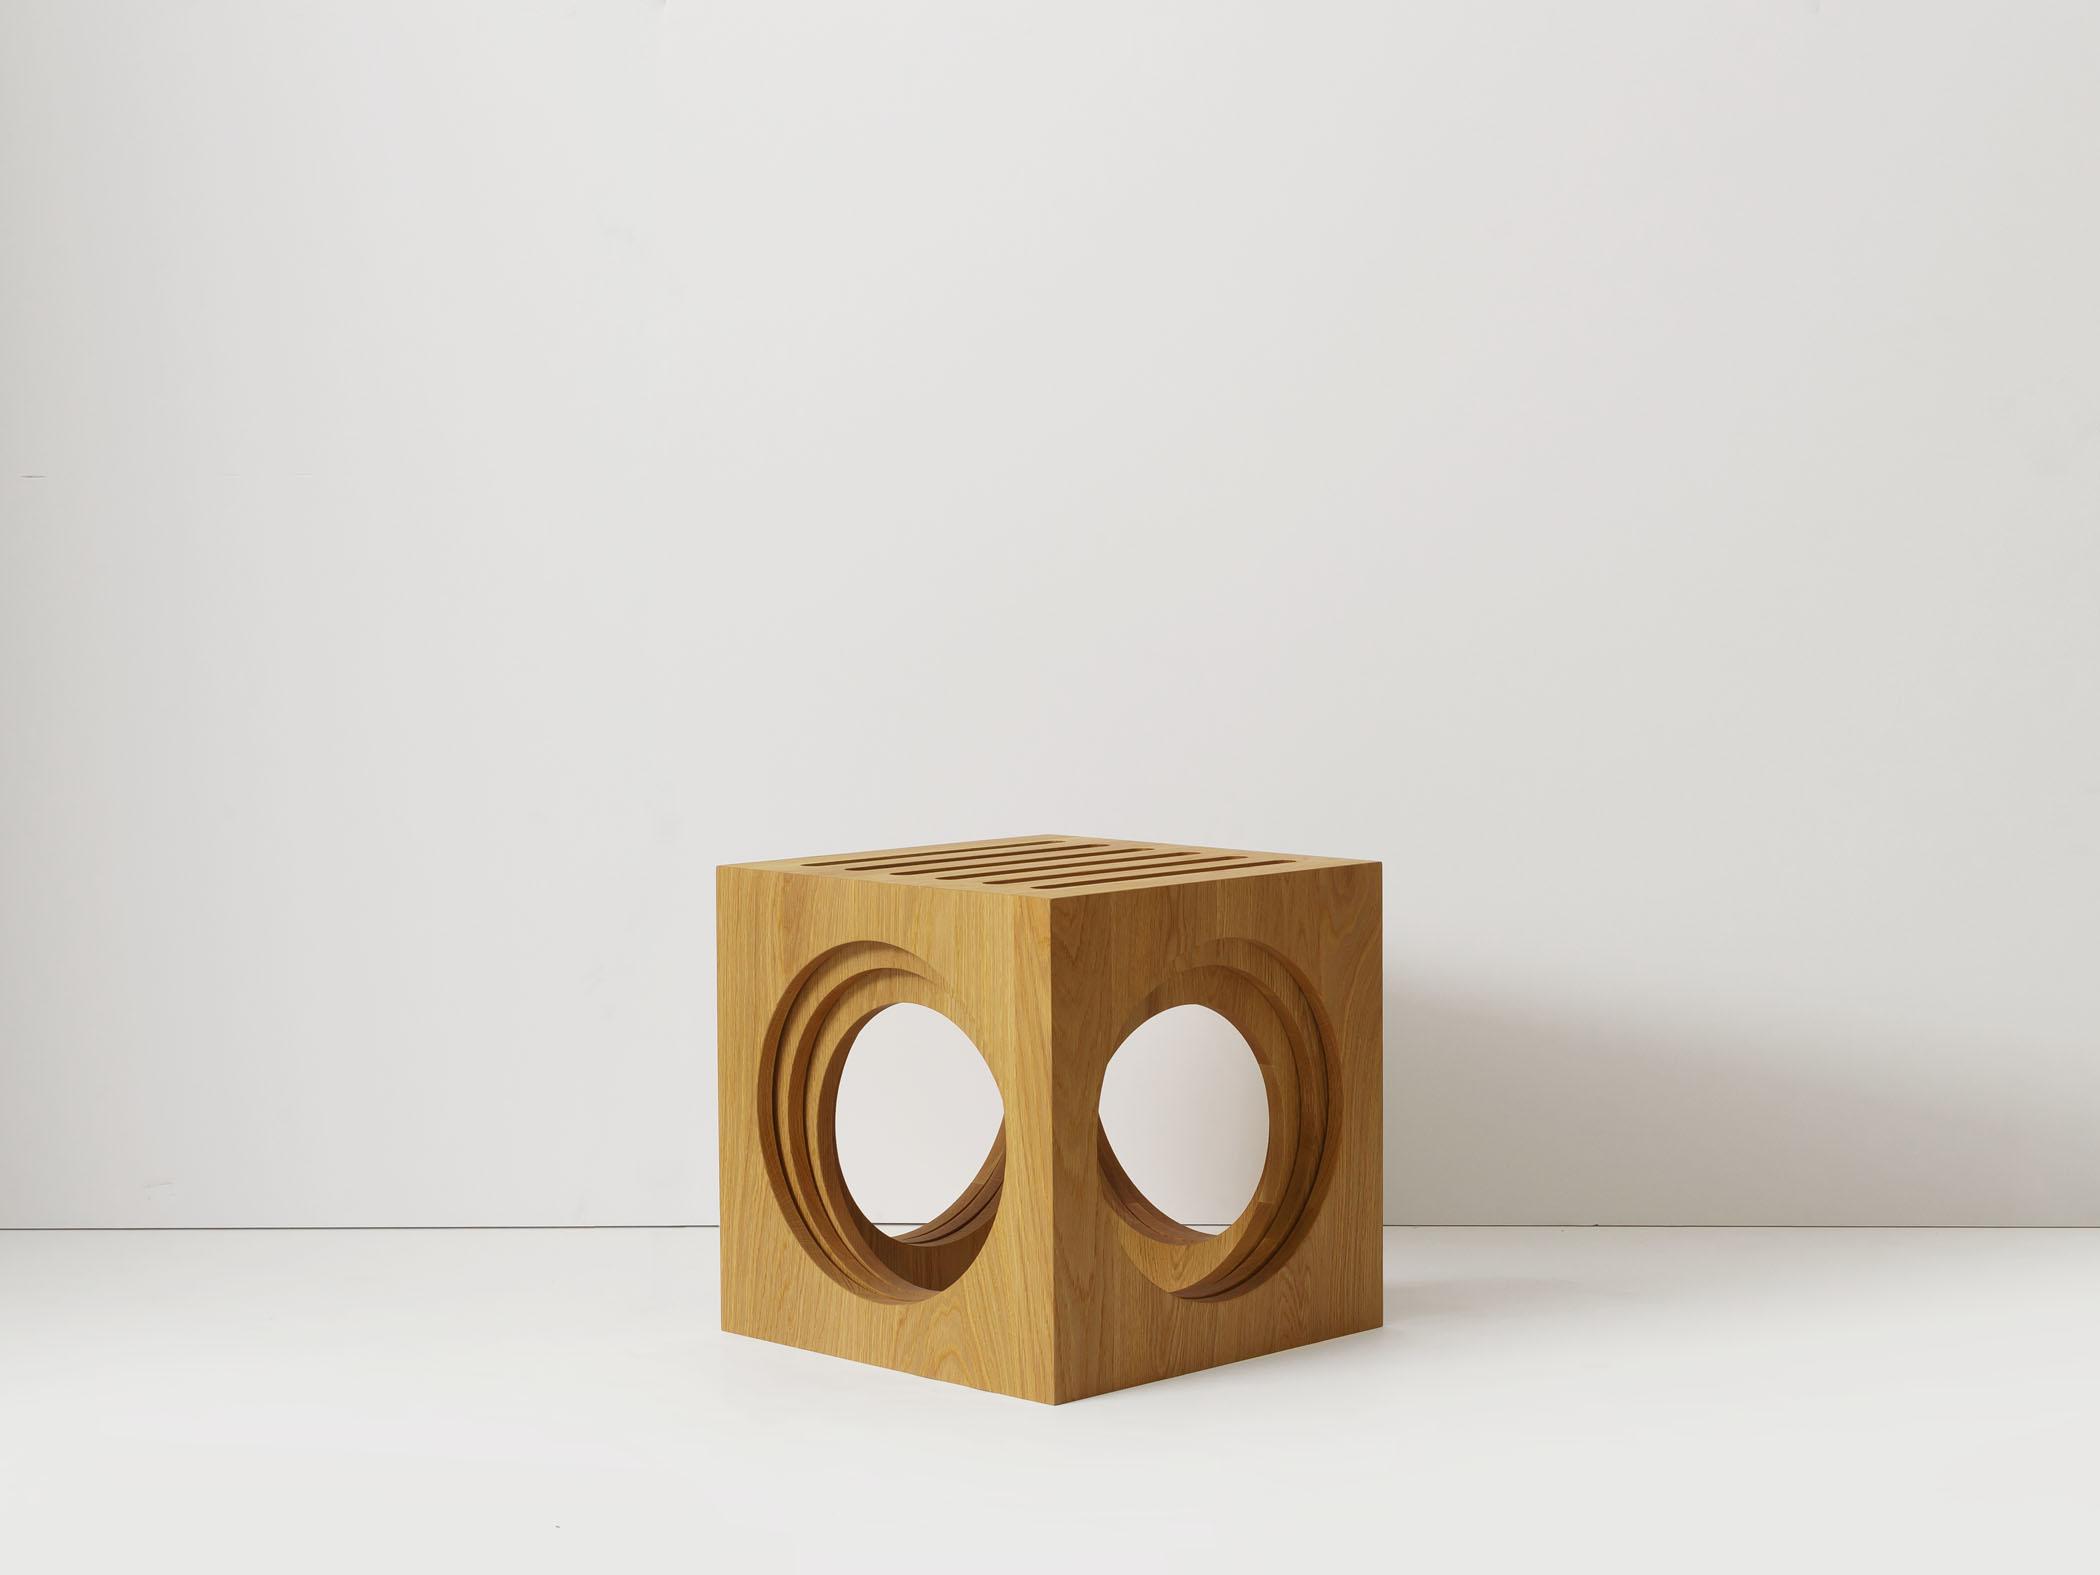 3 Blocks nesting tables/stools